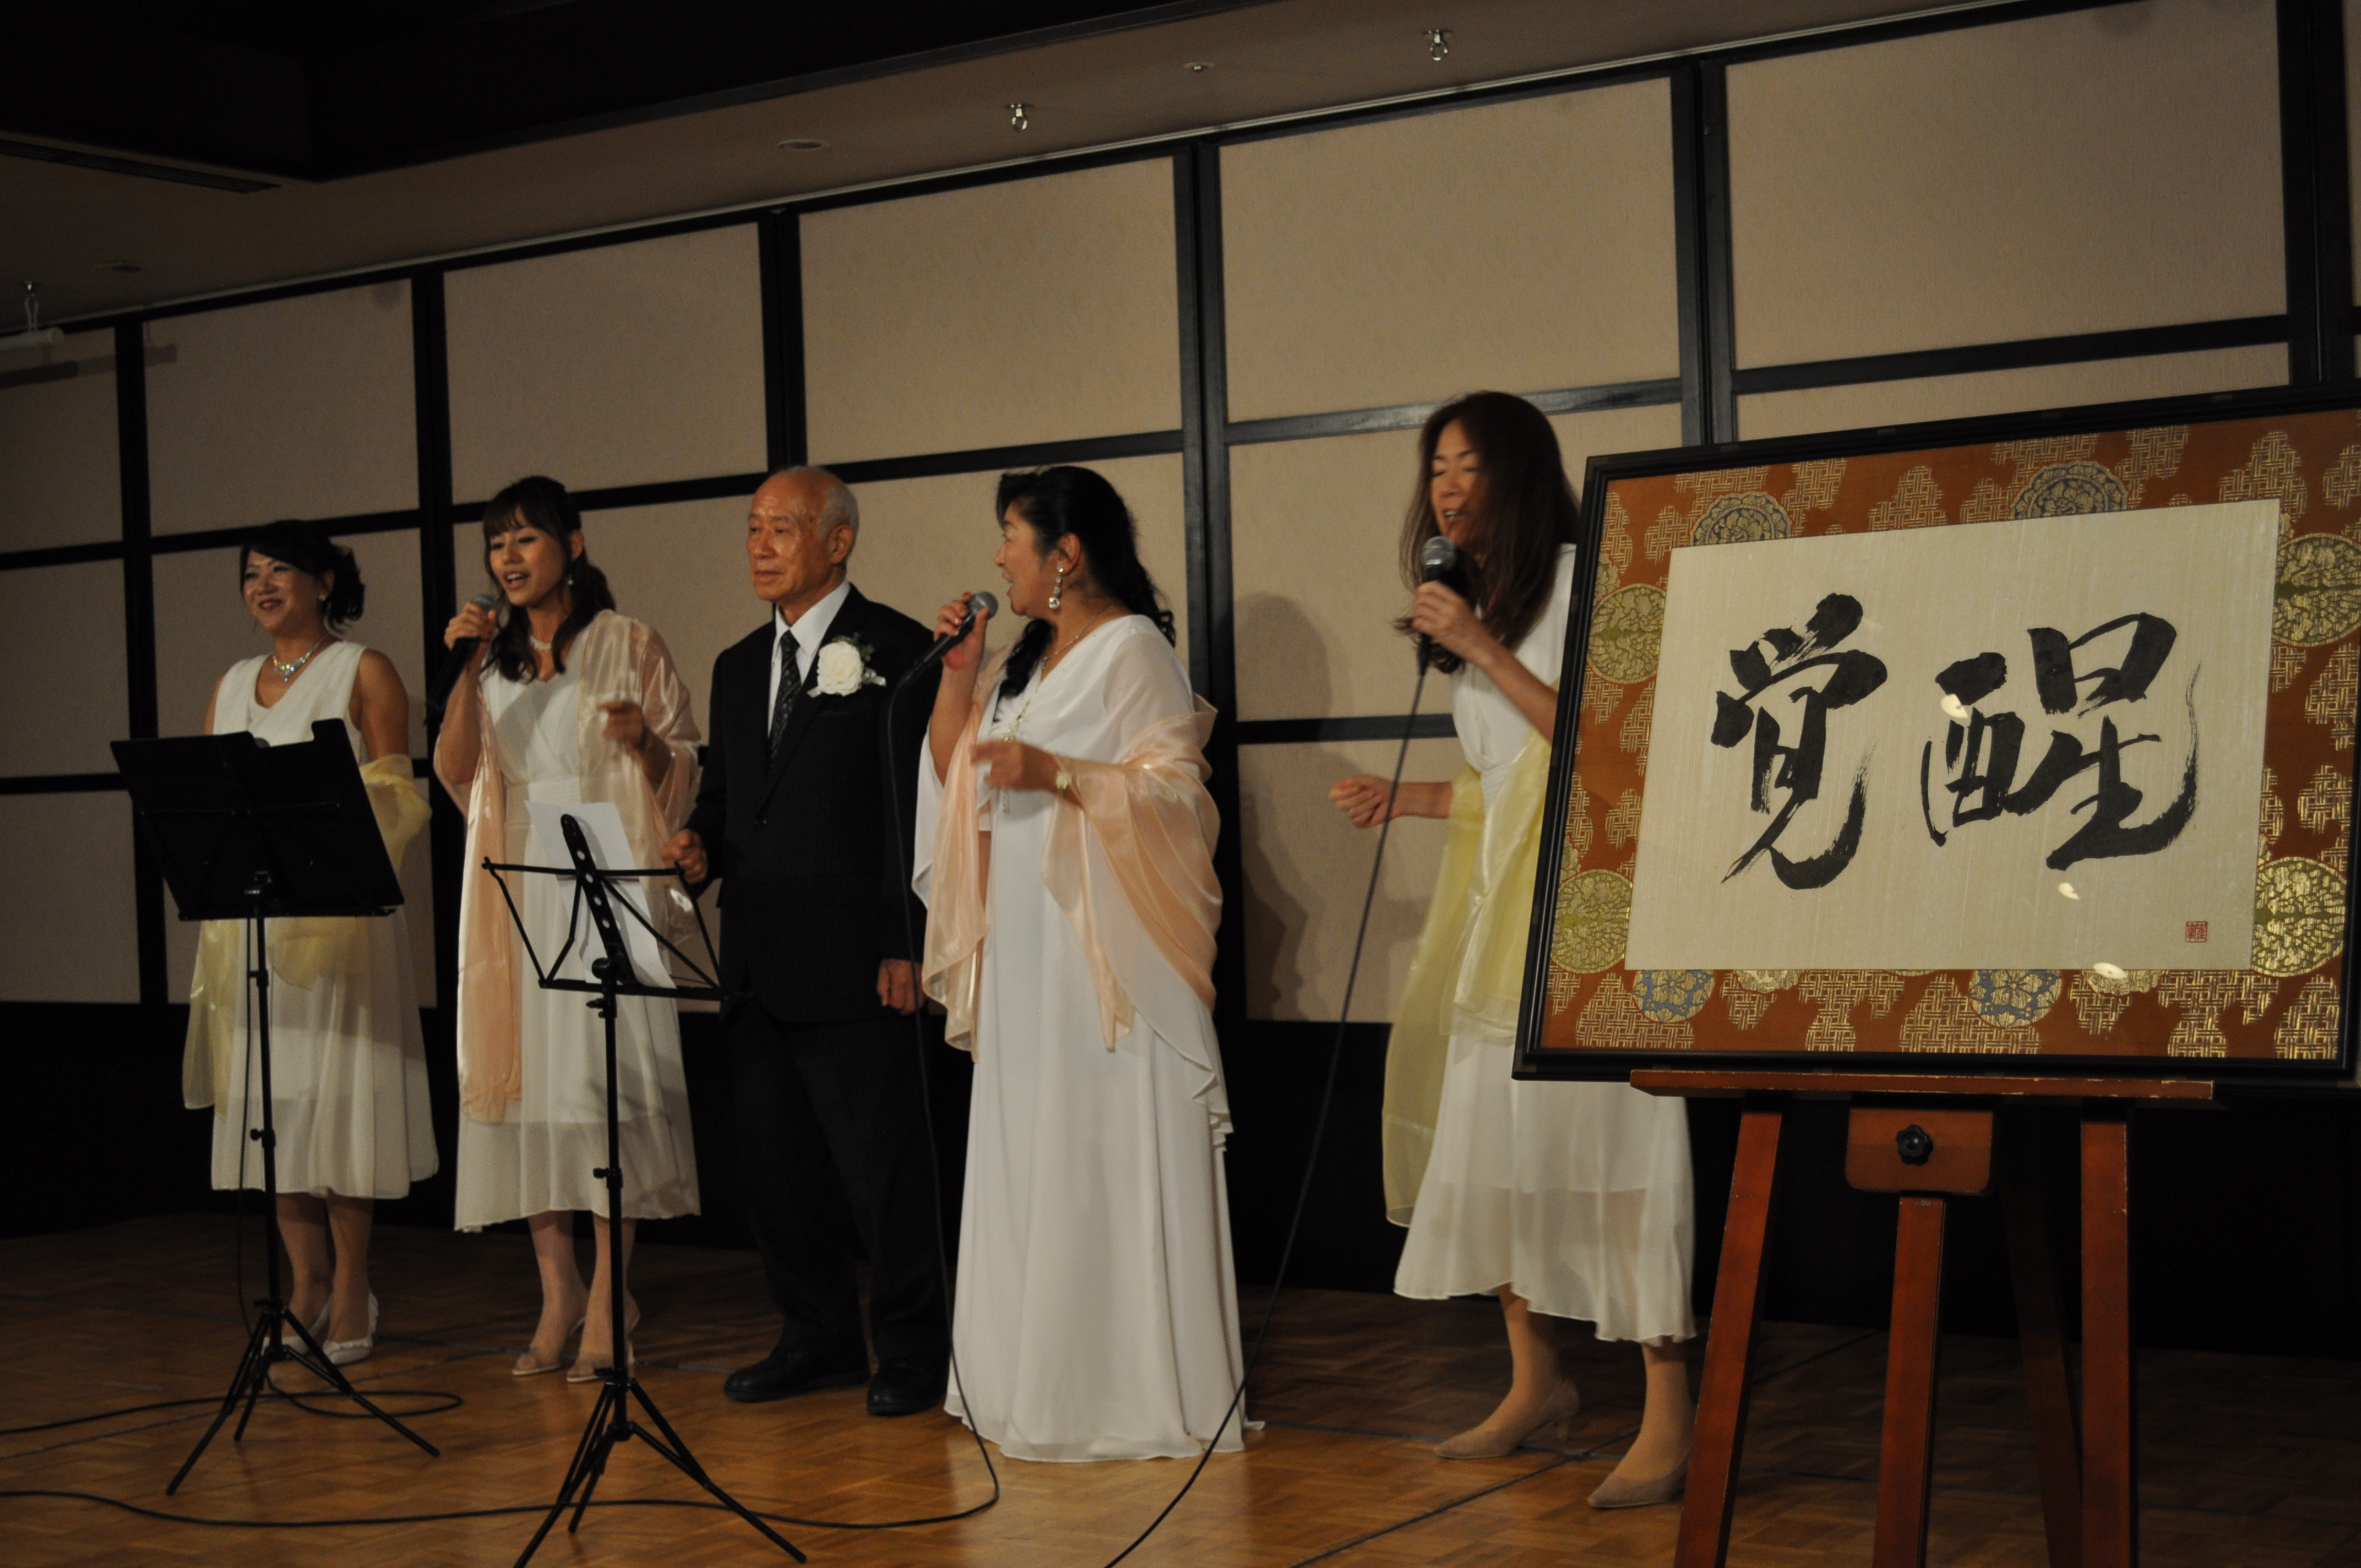 DSC 0525 - 第6回思風会全国大会2018in東京開催